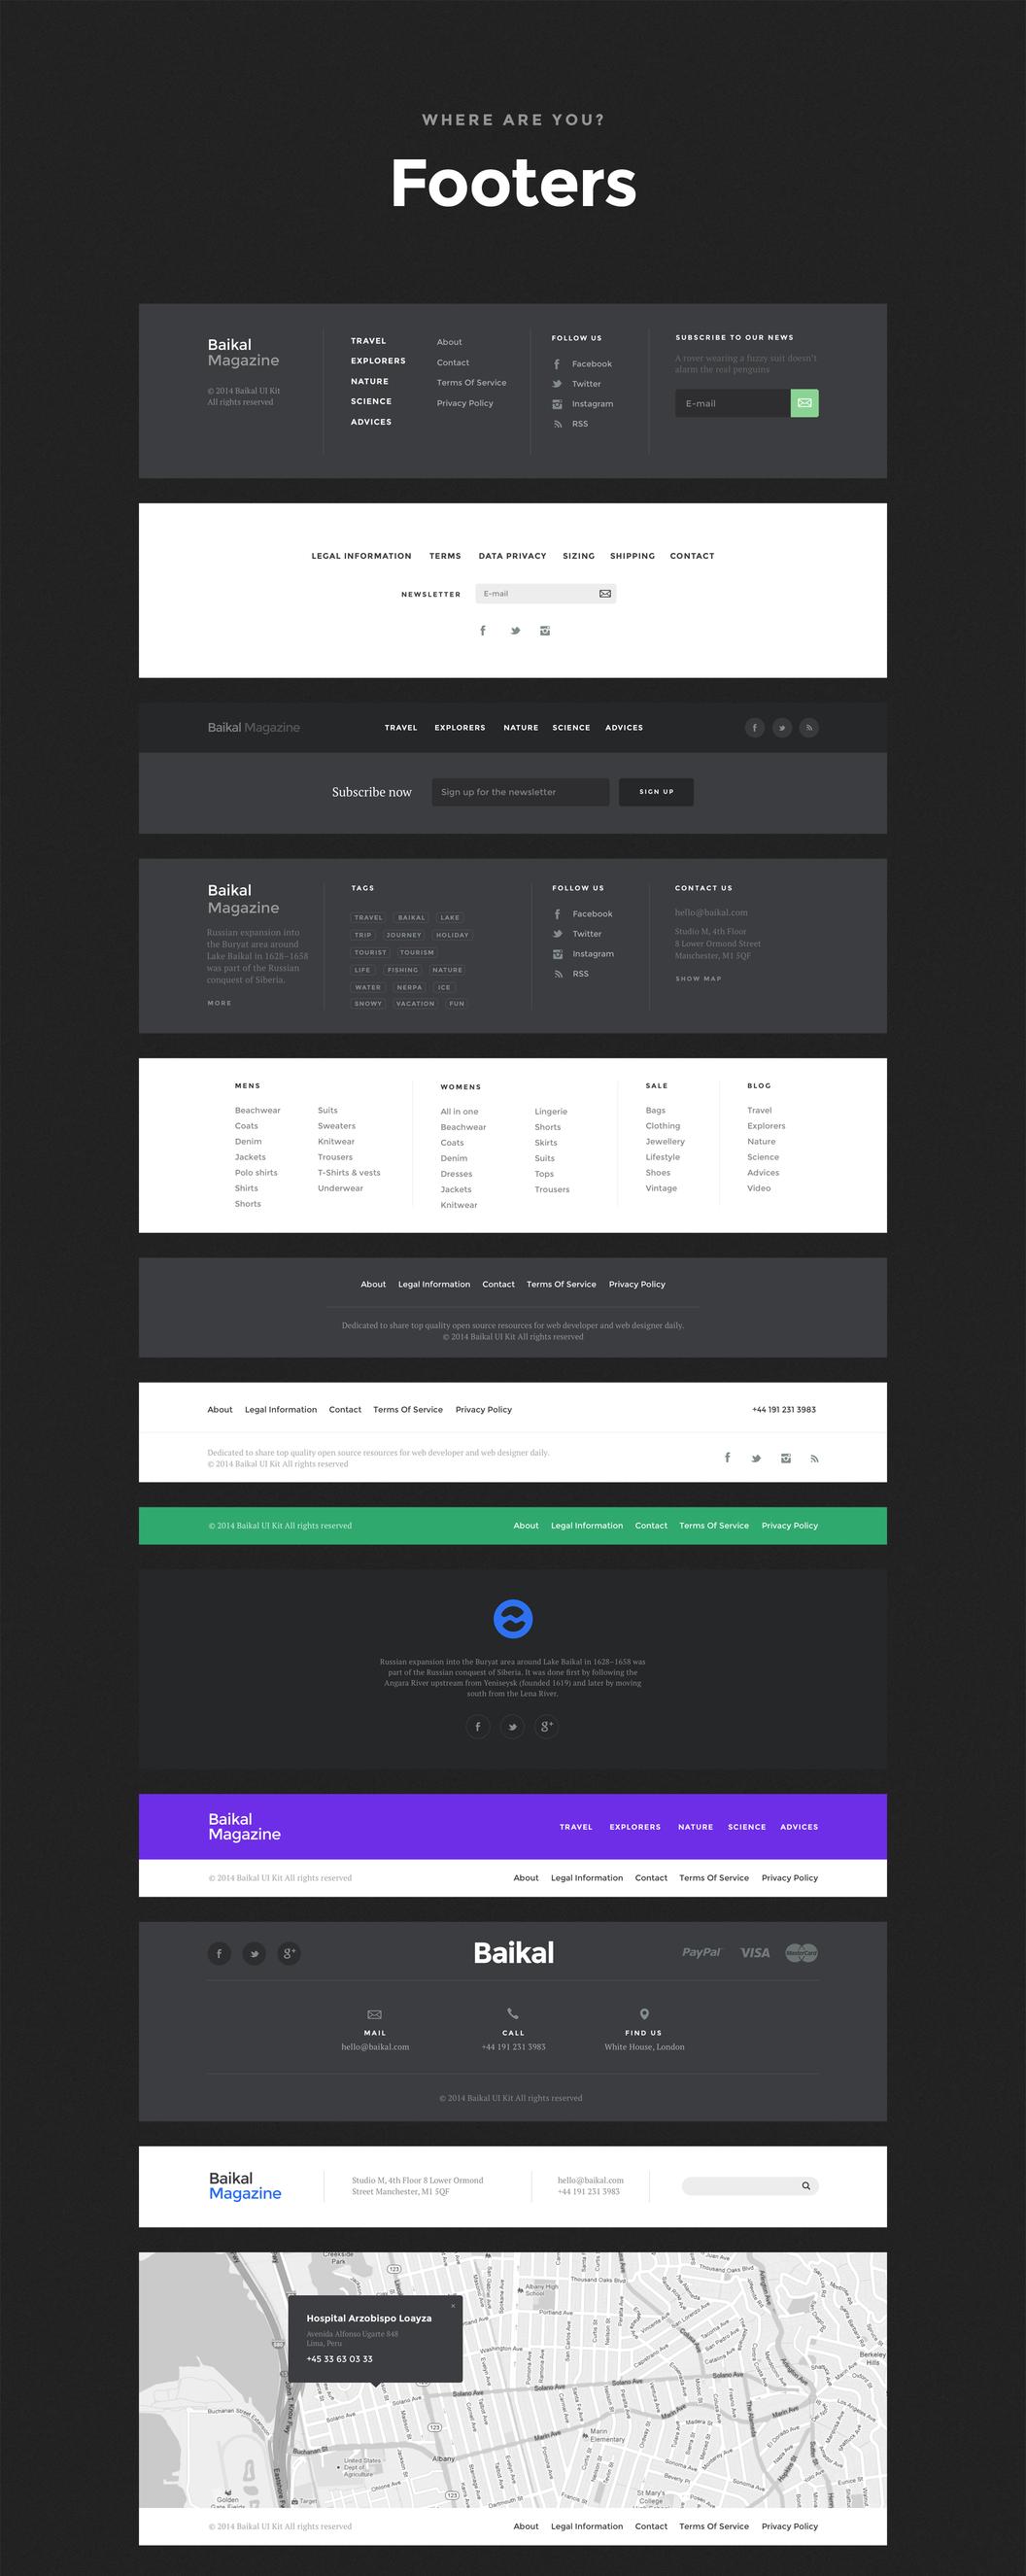 web ui design tools - full_Footers_1421784288387